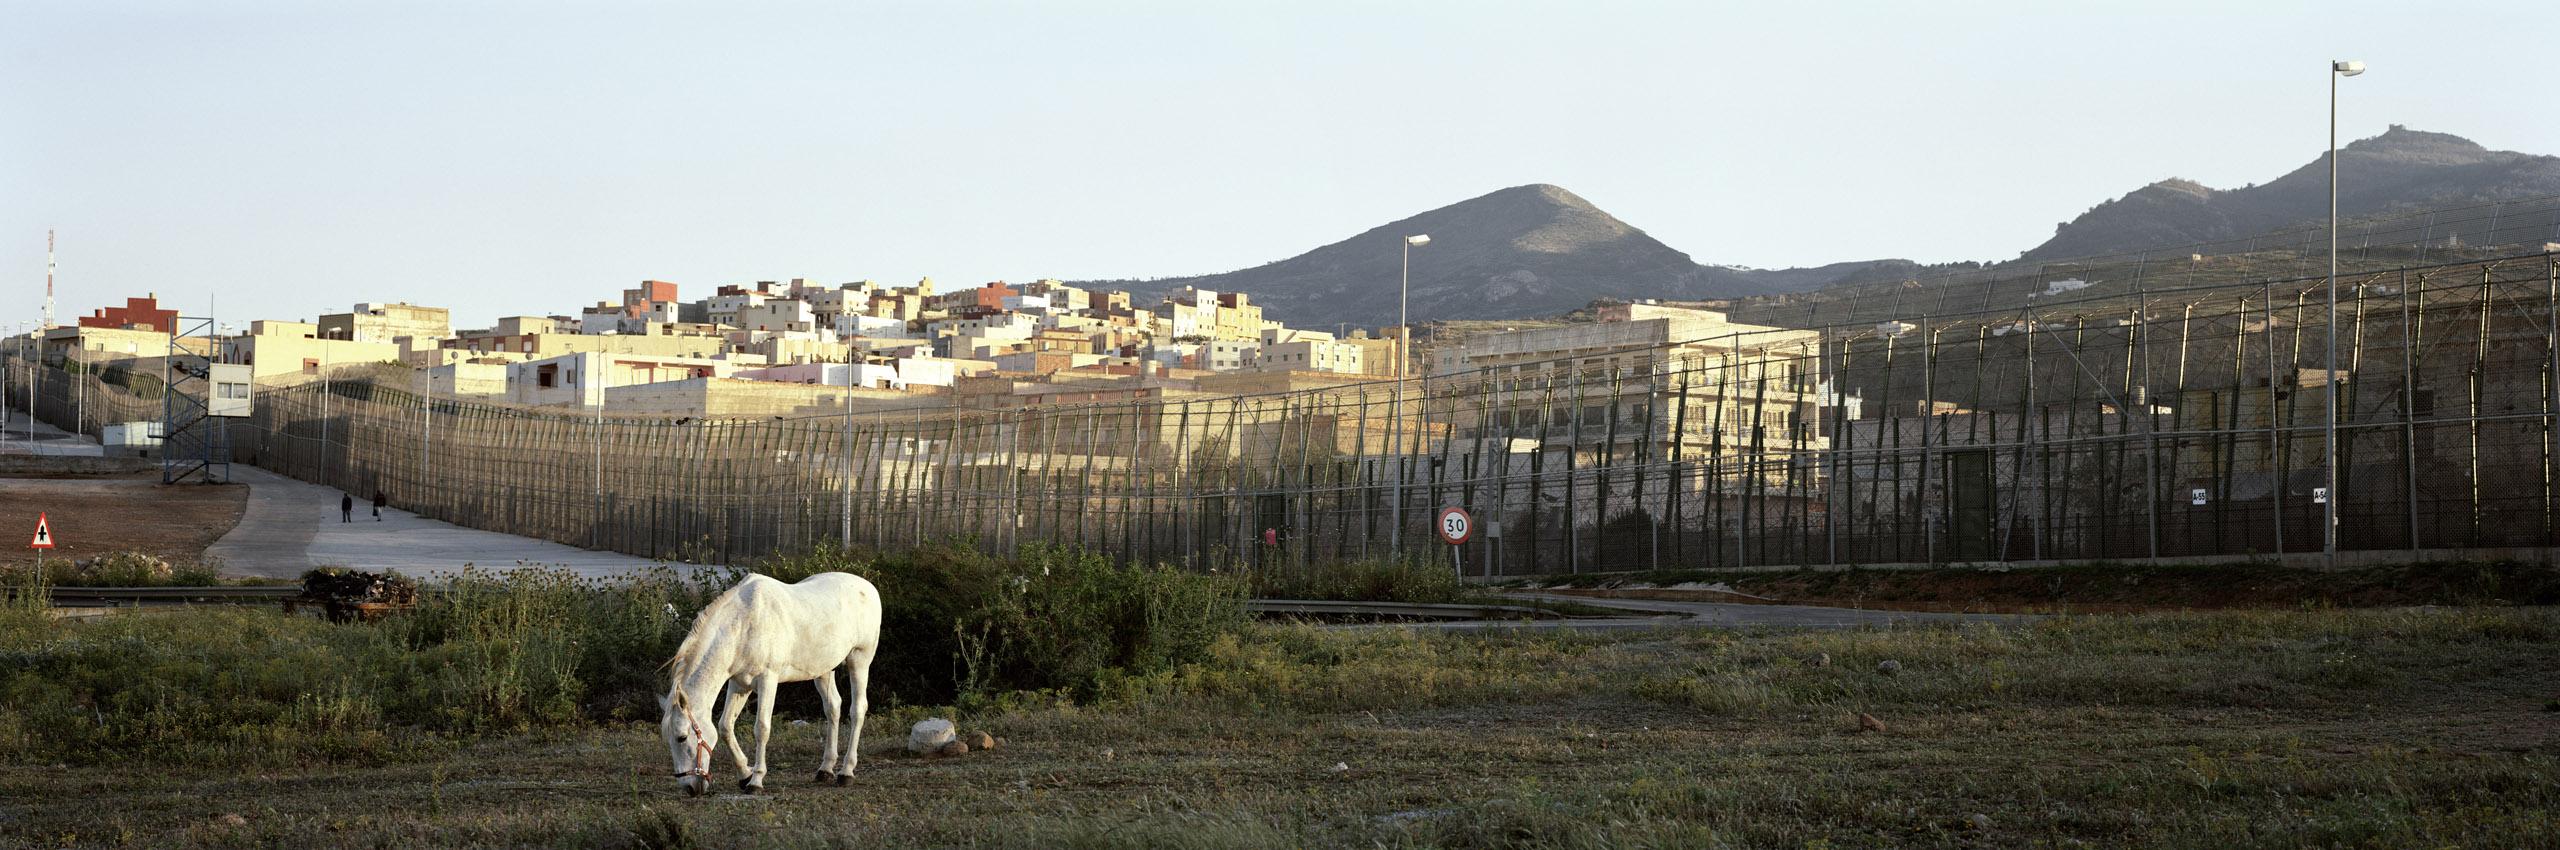 Melilla, Spain, 2009.